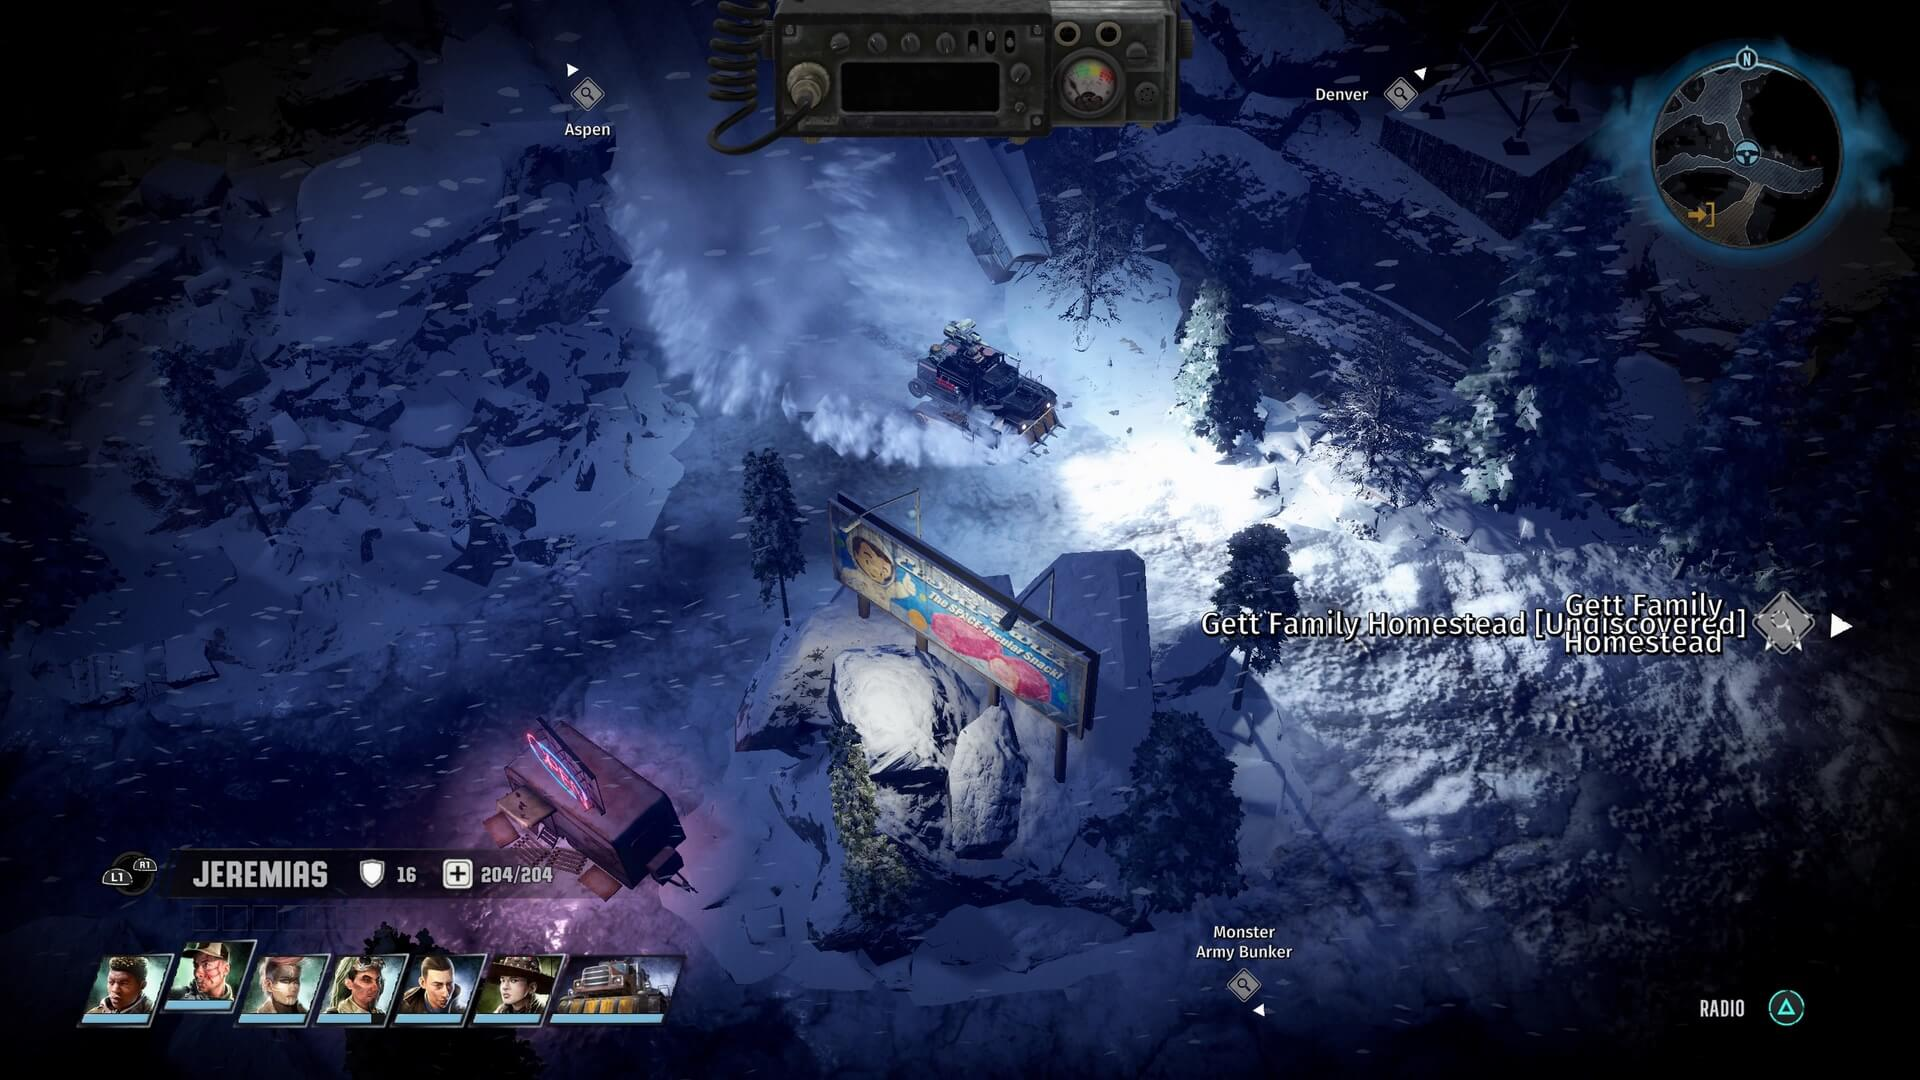 Wasteland 3, inXile, Deep Silver, PC., Xbox, PS4, RPG, CRPG, Rangers, Exploração, Delfos